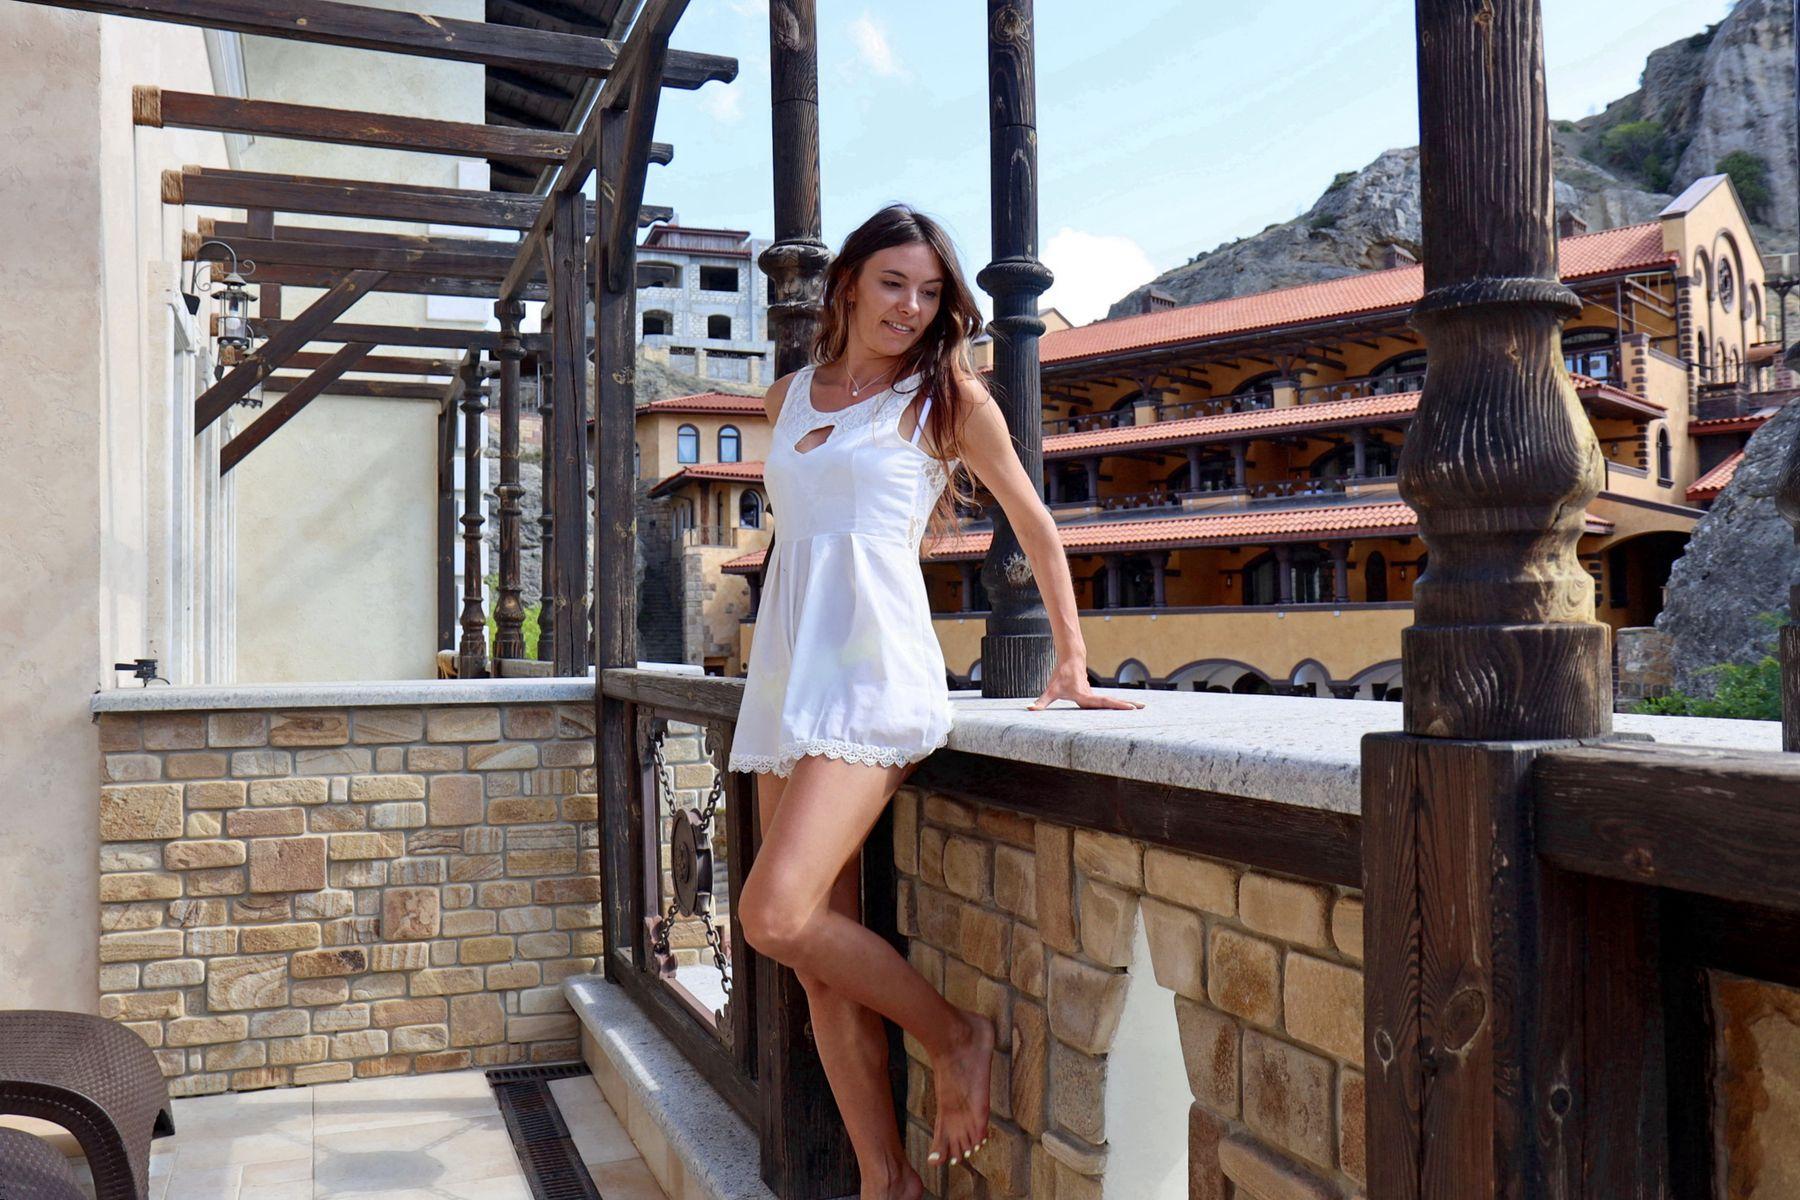 Девушка на балконе Девушка на балконе отель Судак Крым фотомодель